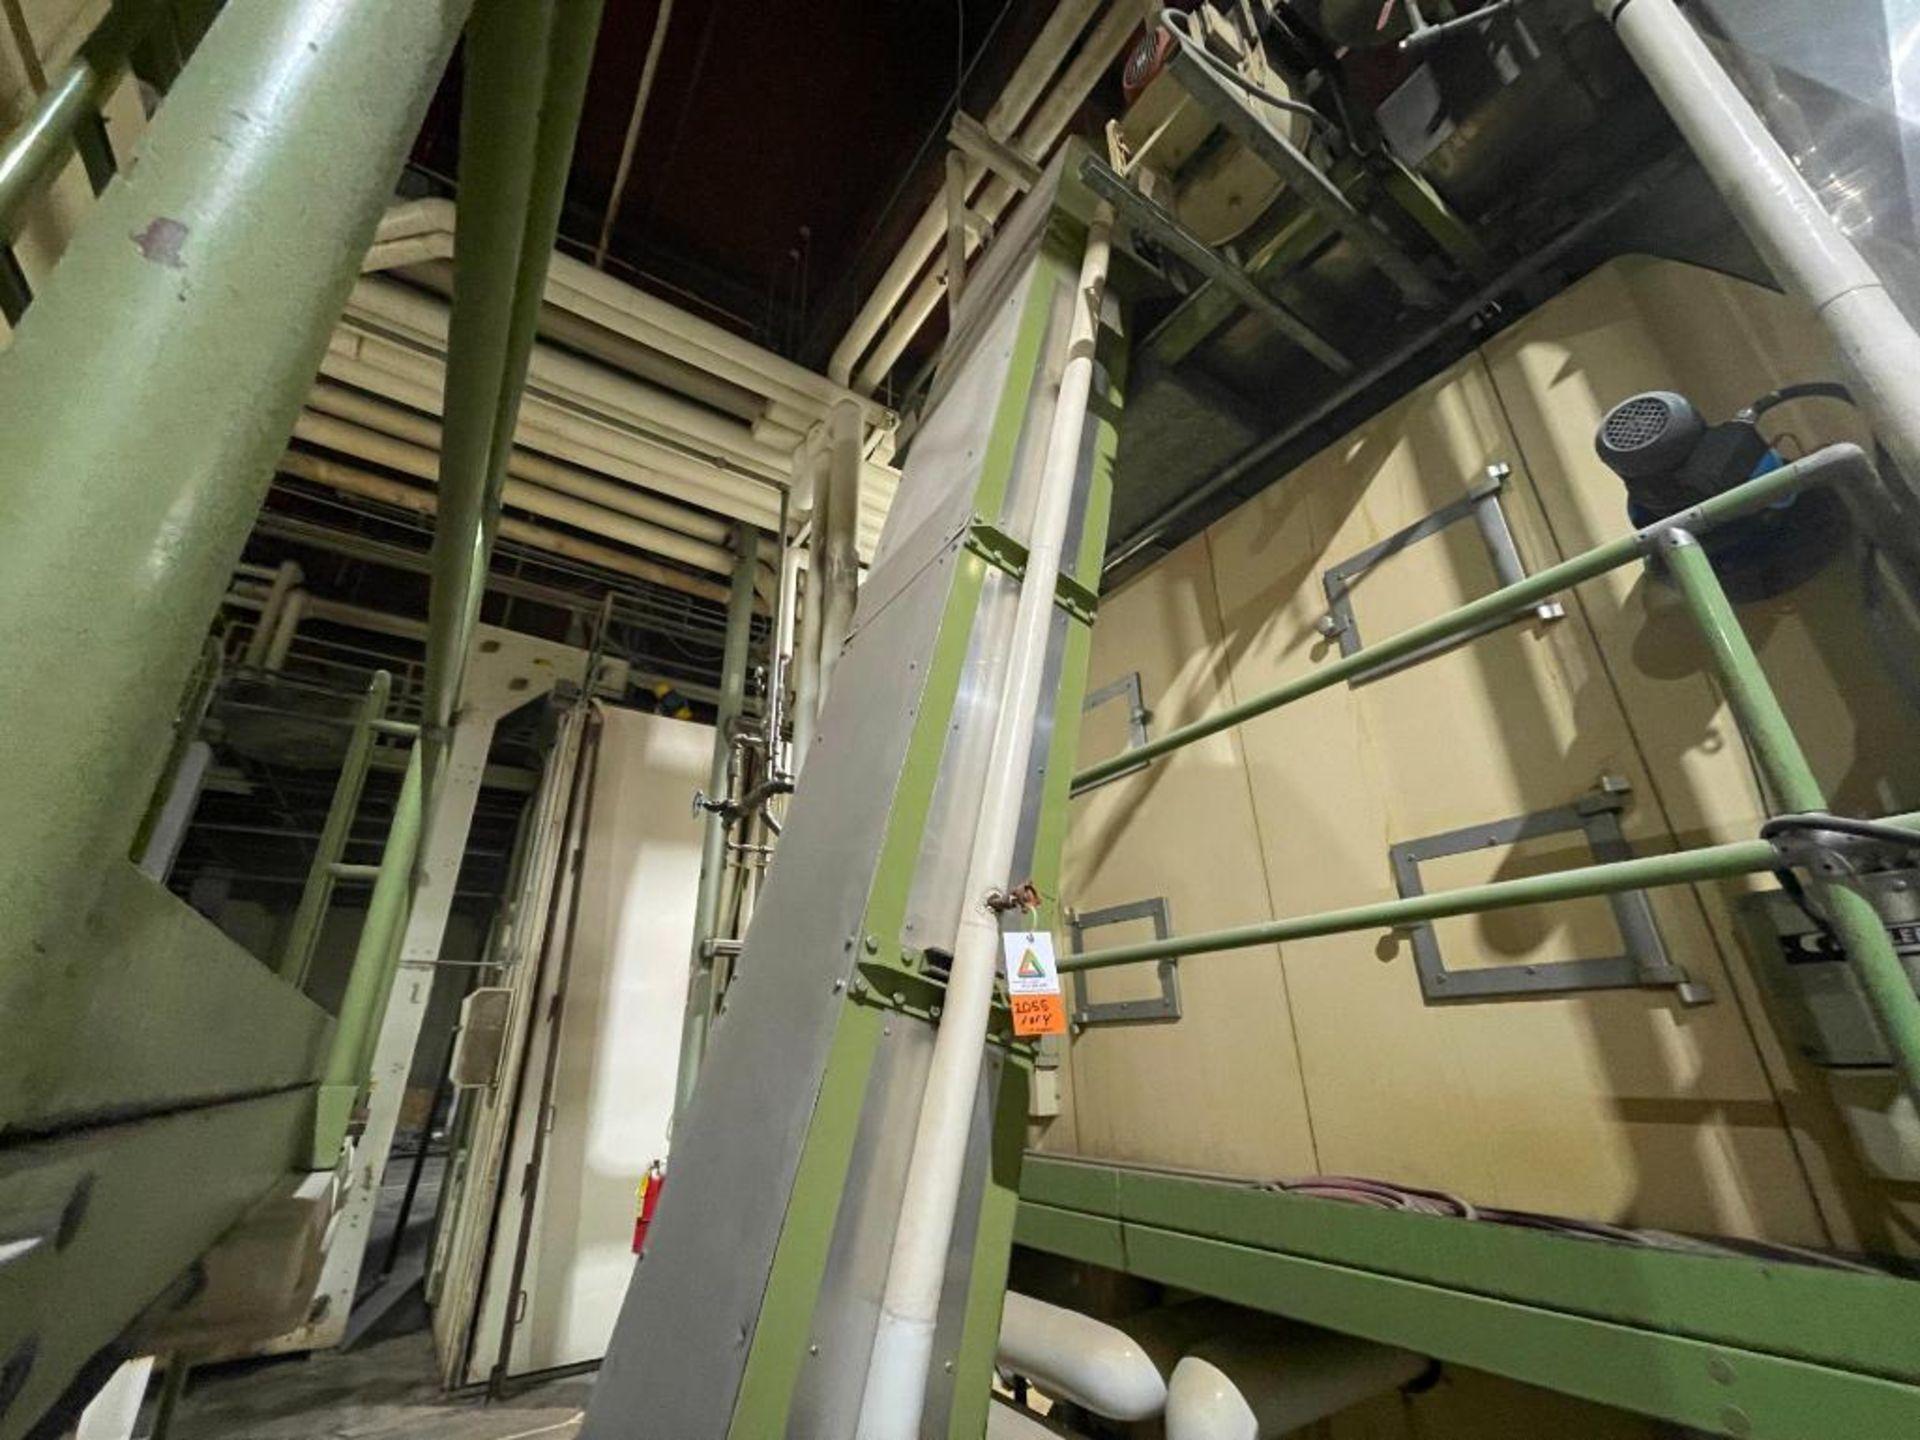 mild steel incline overlapping bucket conveyor - Image 2 of 14